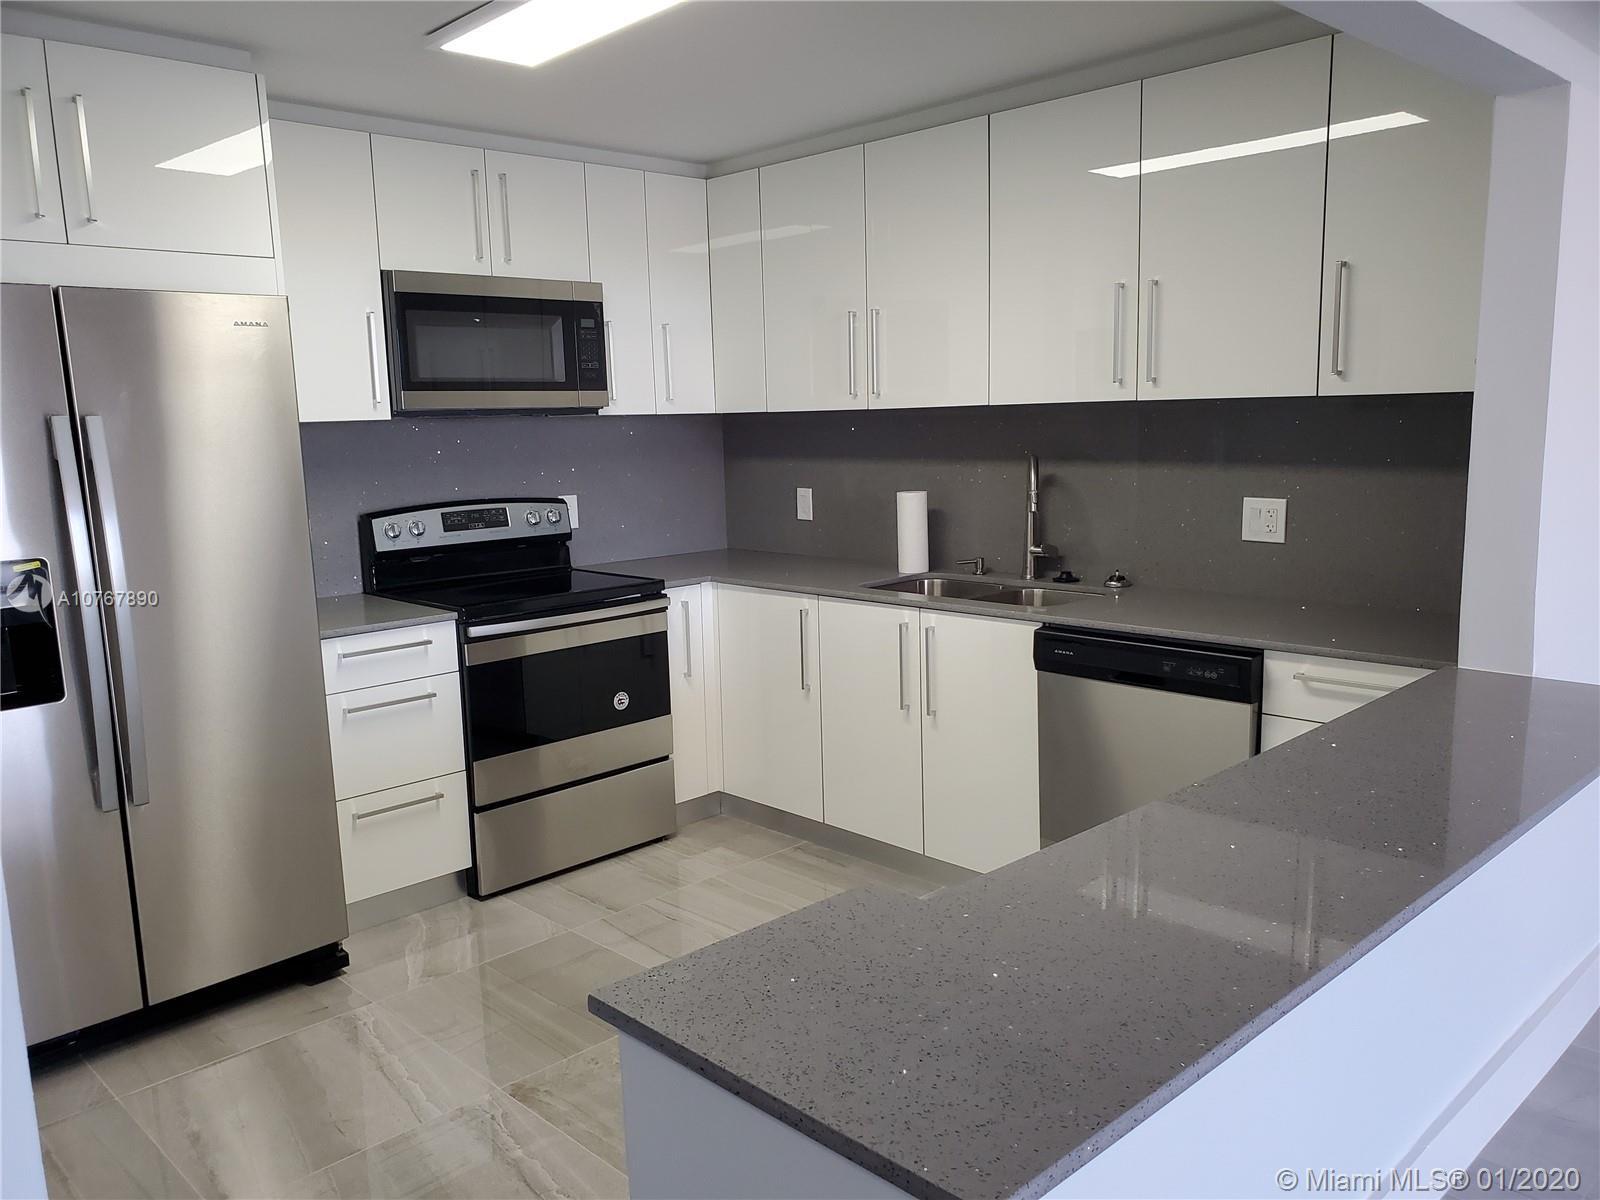 13499 Biscayne Blvd # 1105, North Miami, Florida 33181, 2 Bedrooms Bedrooms, ,2 BathroomsBathrooms,Residential,For Sale,13499 Biscayne Blvd # 1105,A10767890